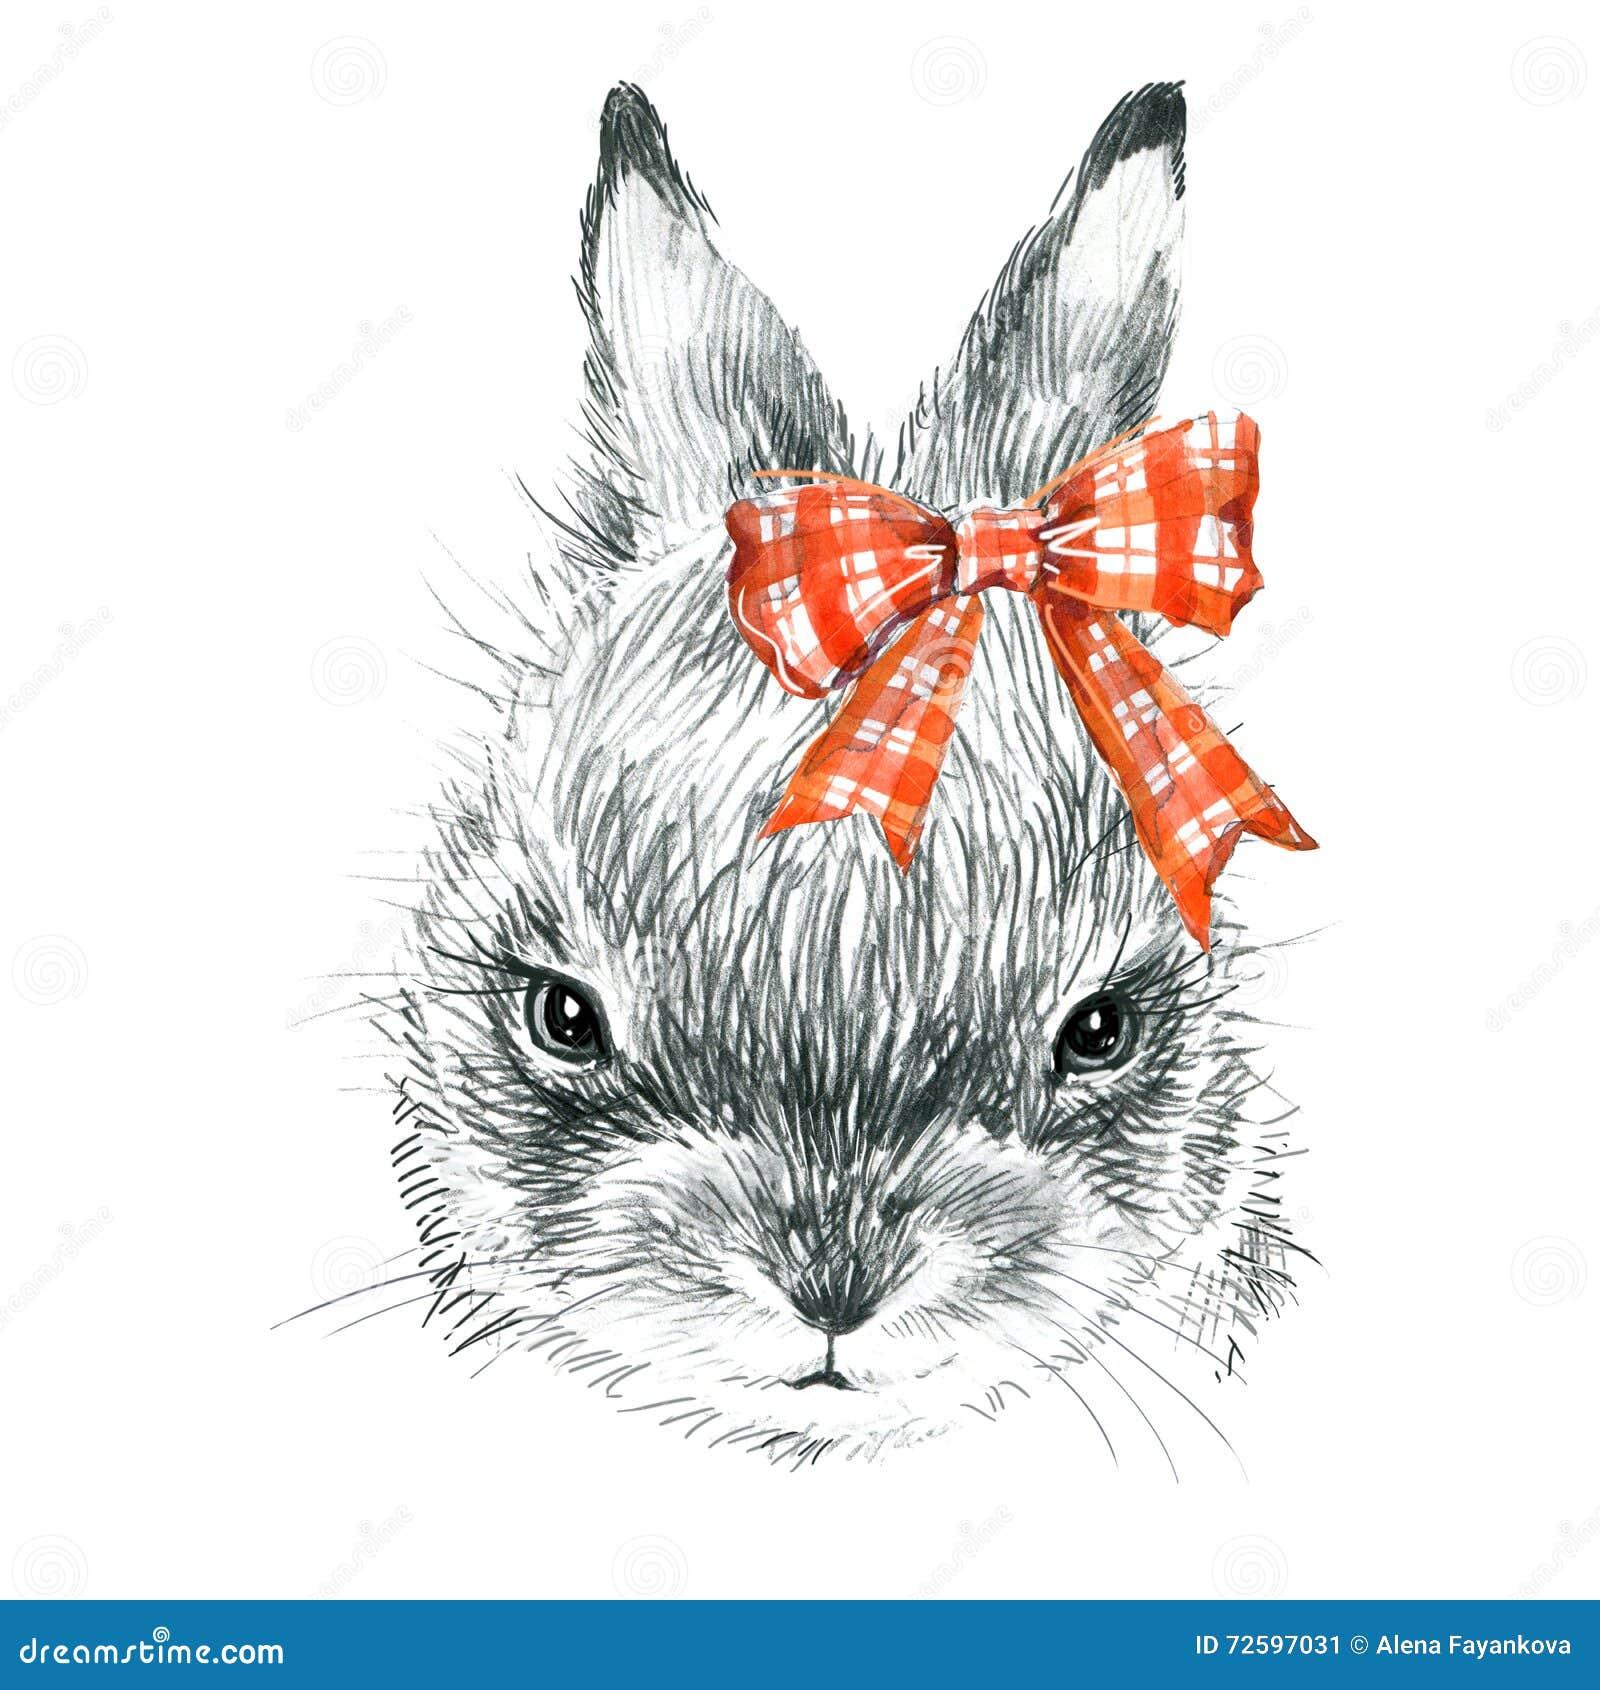 Cute Bunny Rabbit Pencil Sketch Illustration T Shirt Print With